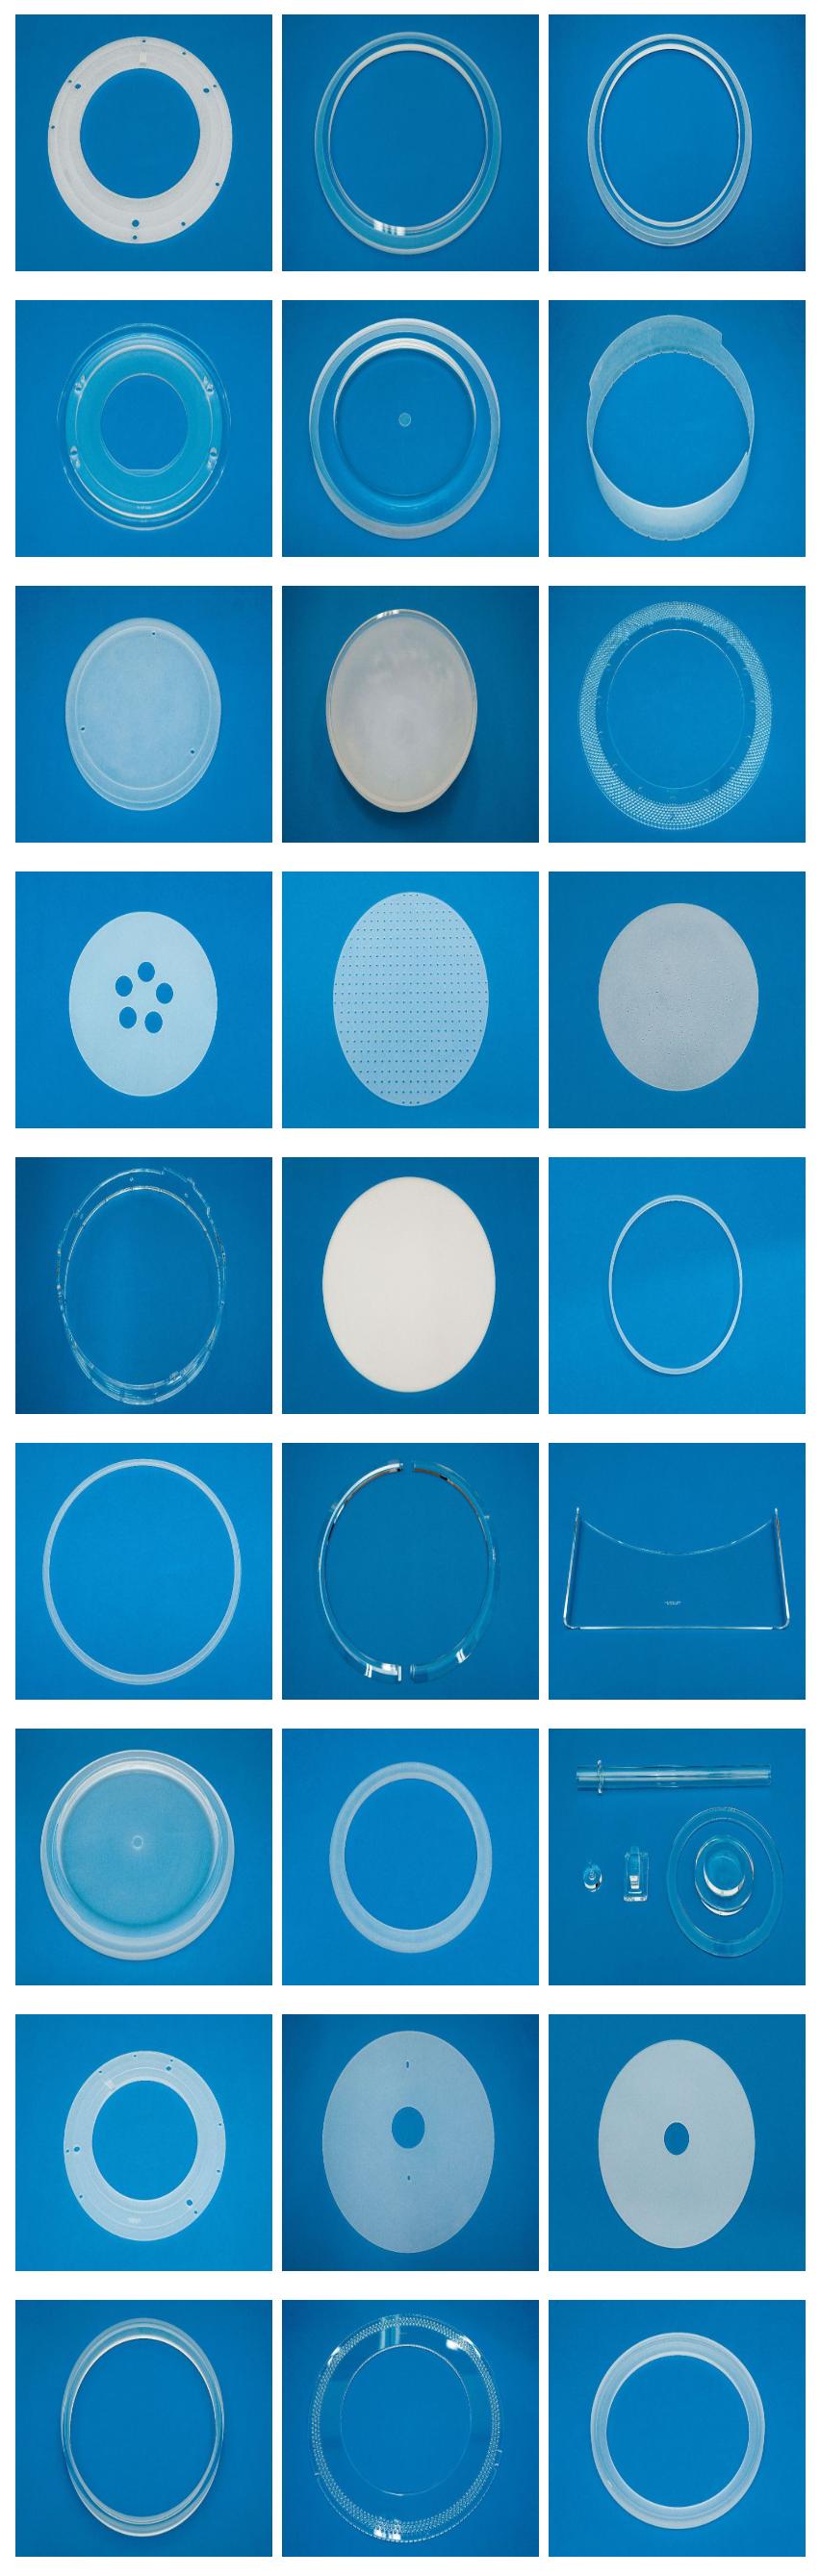 BCnC Quartz for semiconductor Mfg equipment